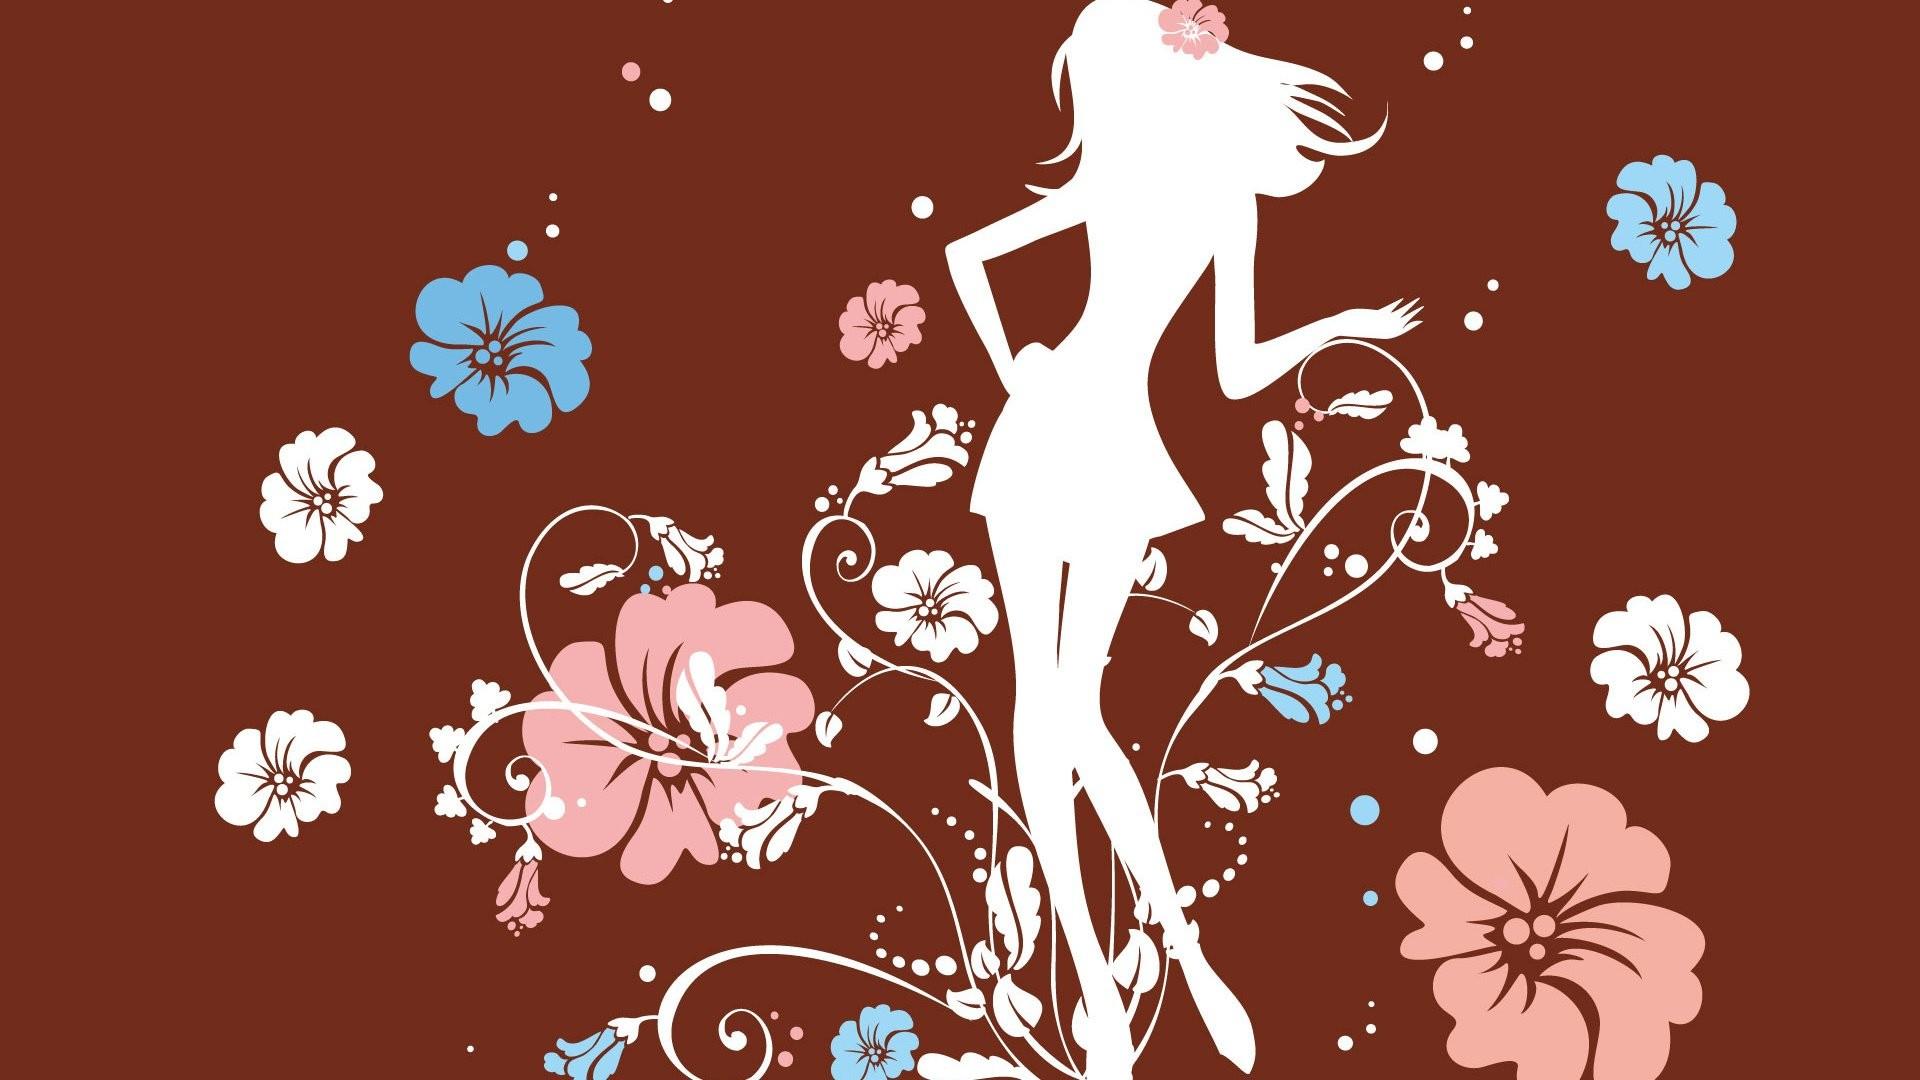 International Women's Day image hd